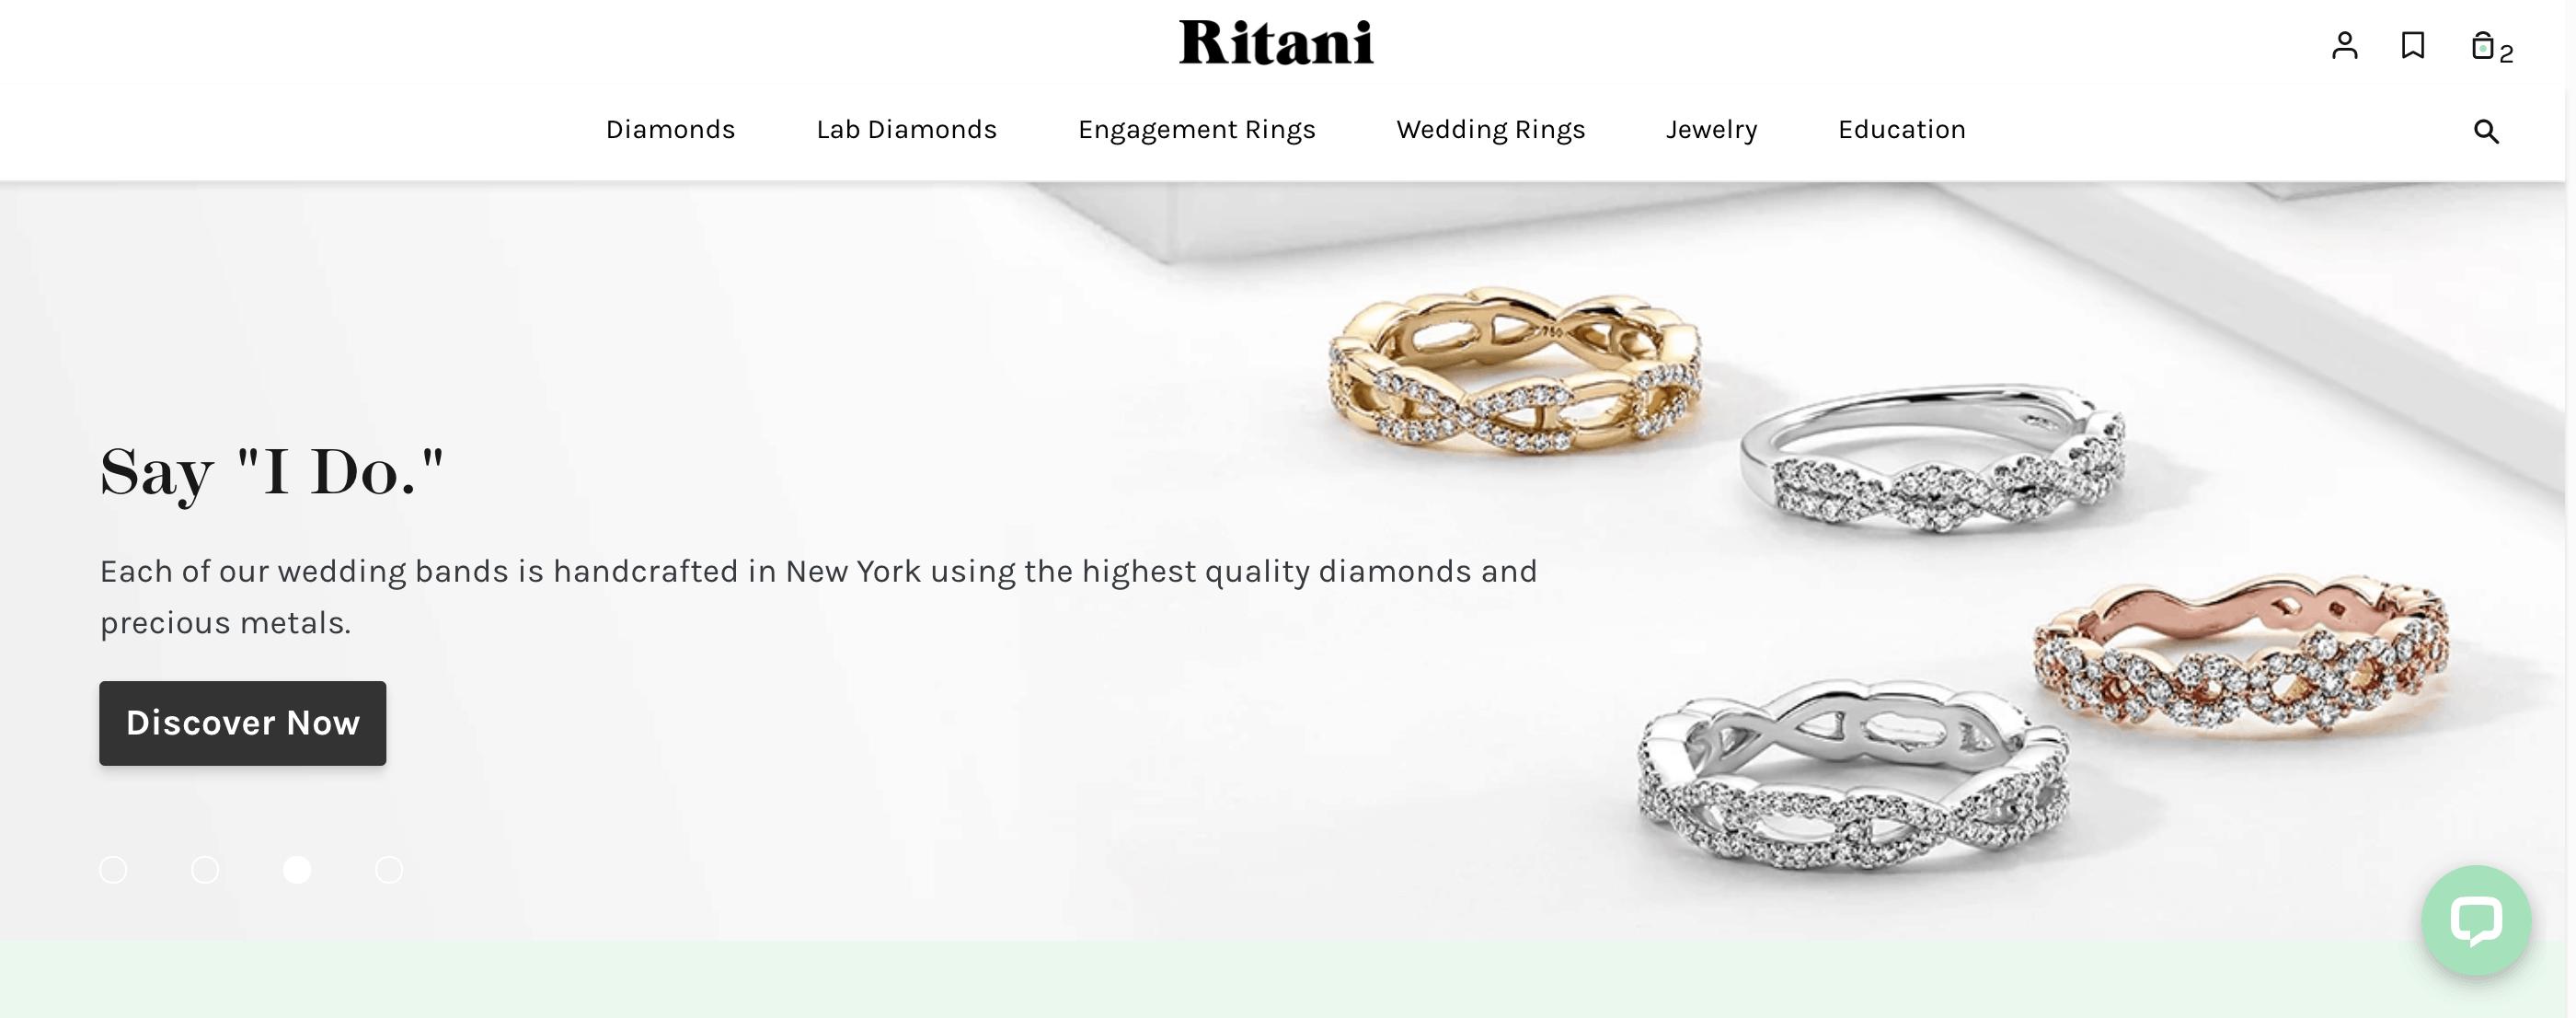 Ritani diamonds